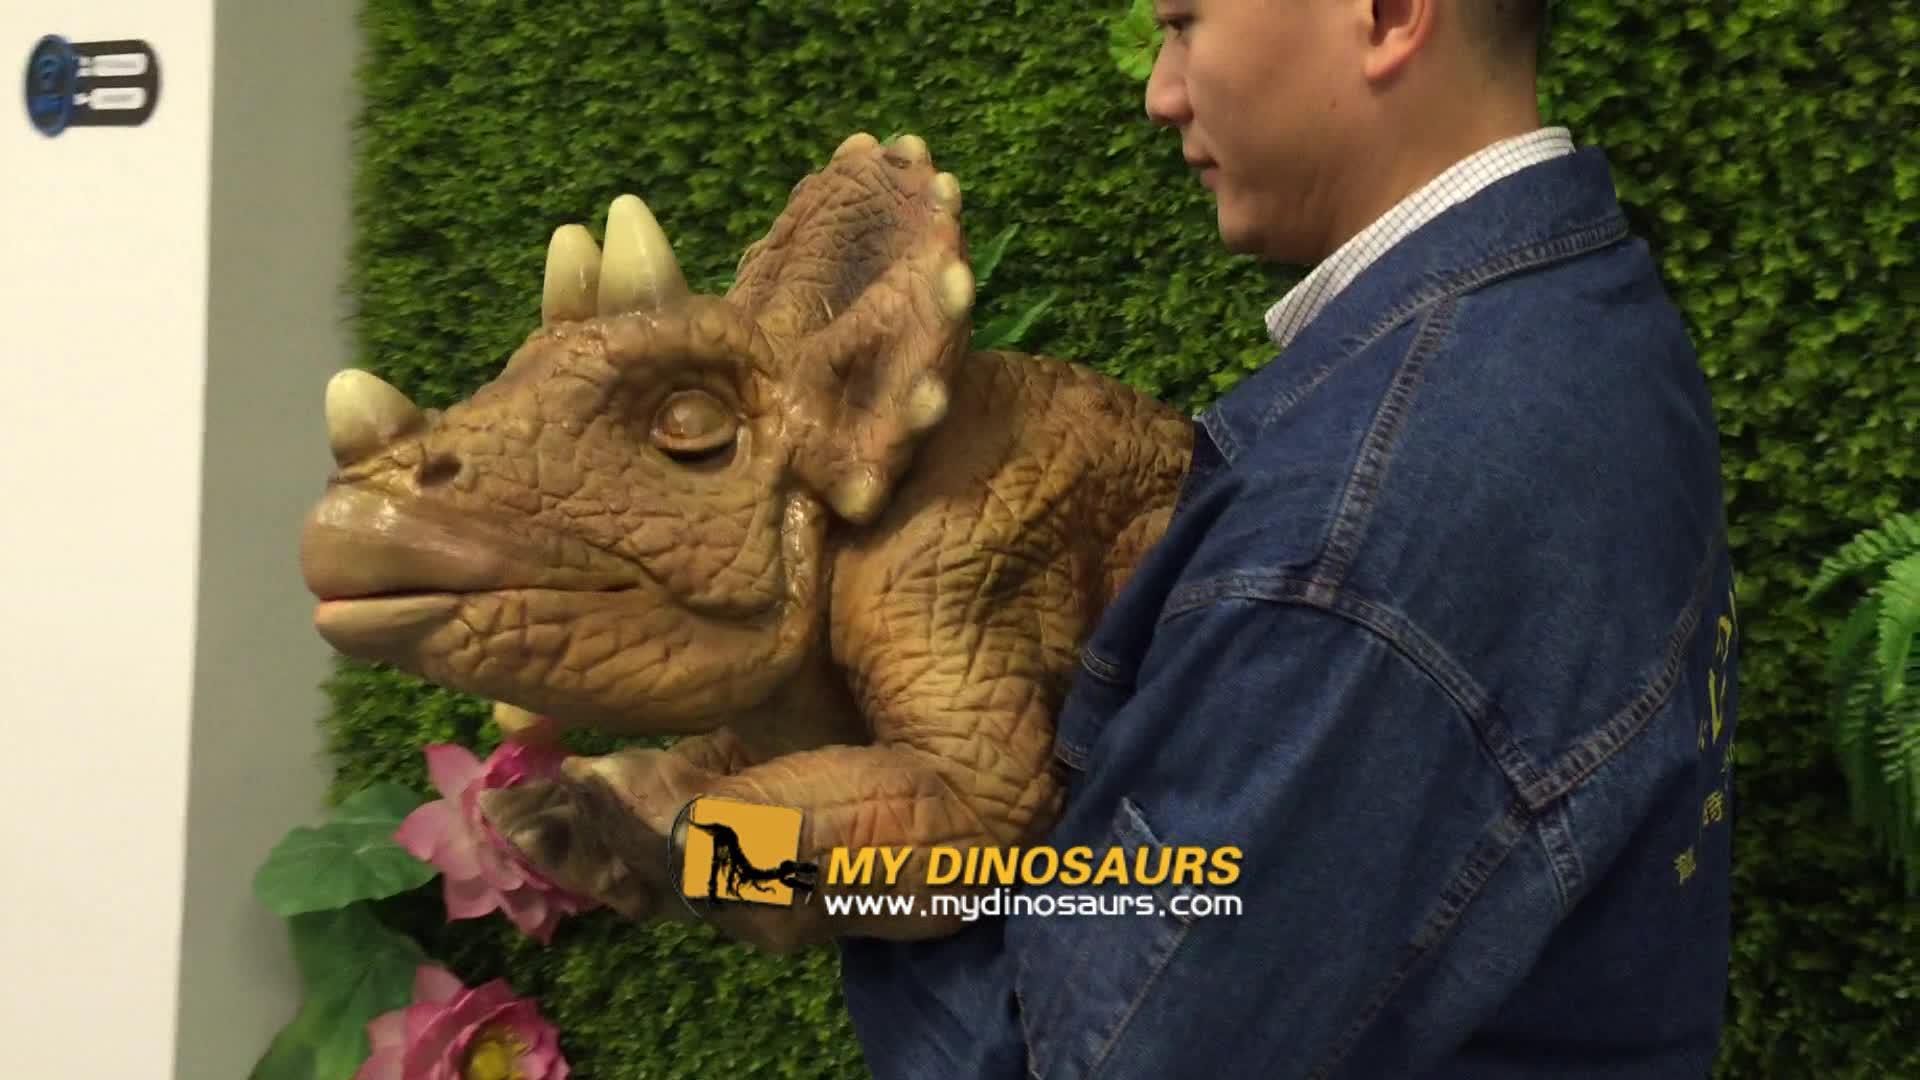 MY Dino-D14-5 Hot Sale Baby Dinosaur Hand Puppet